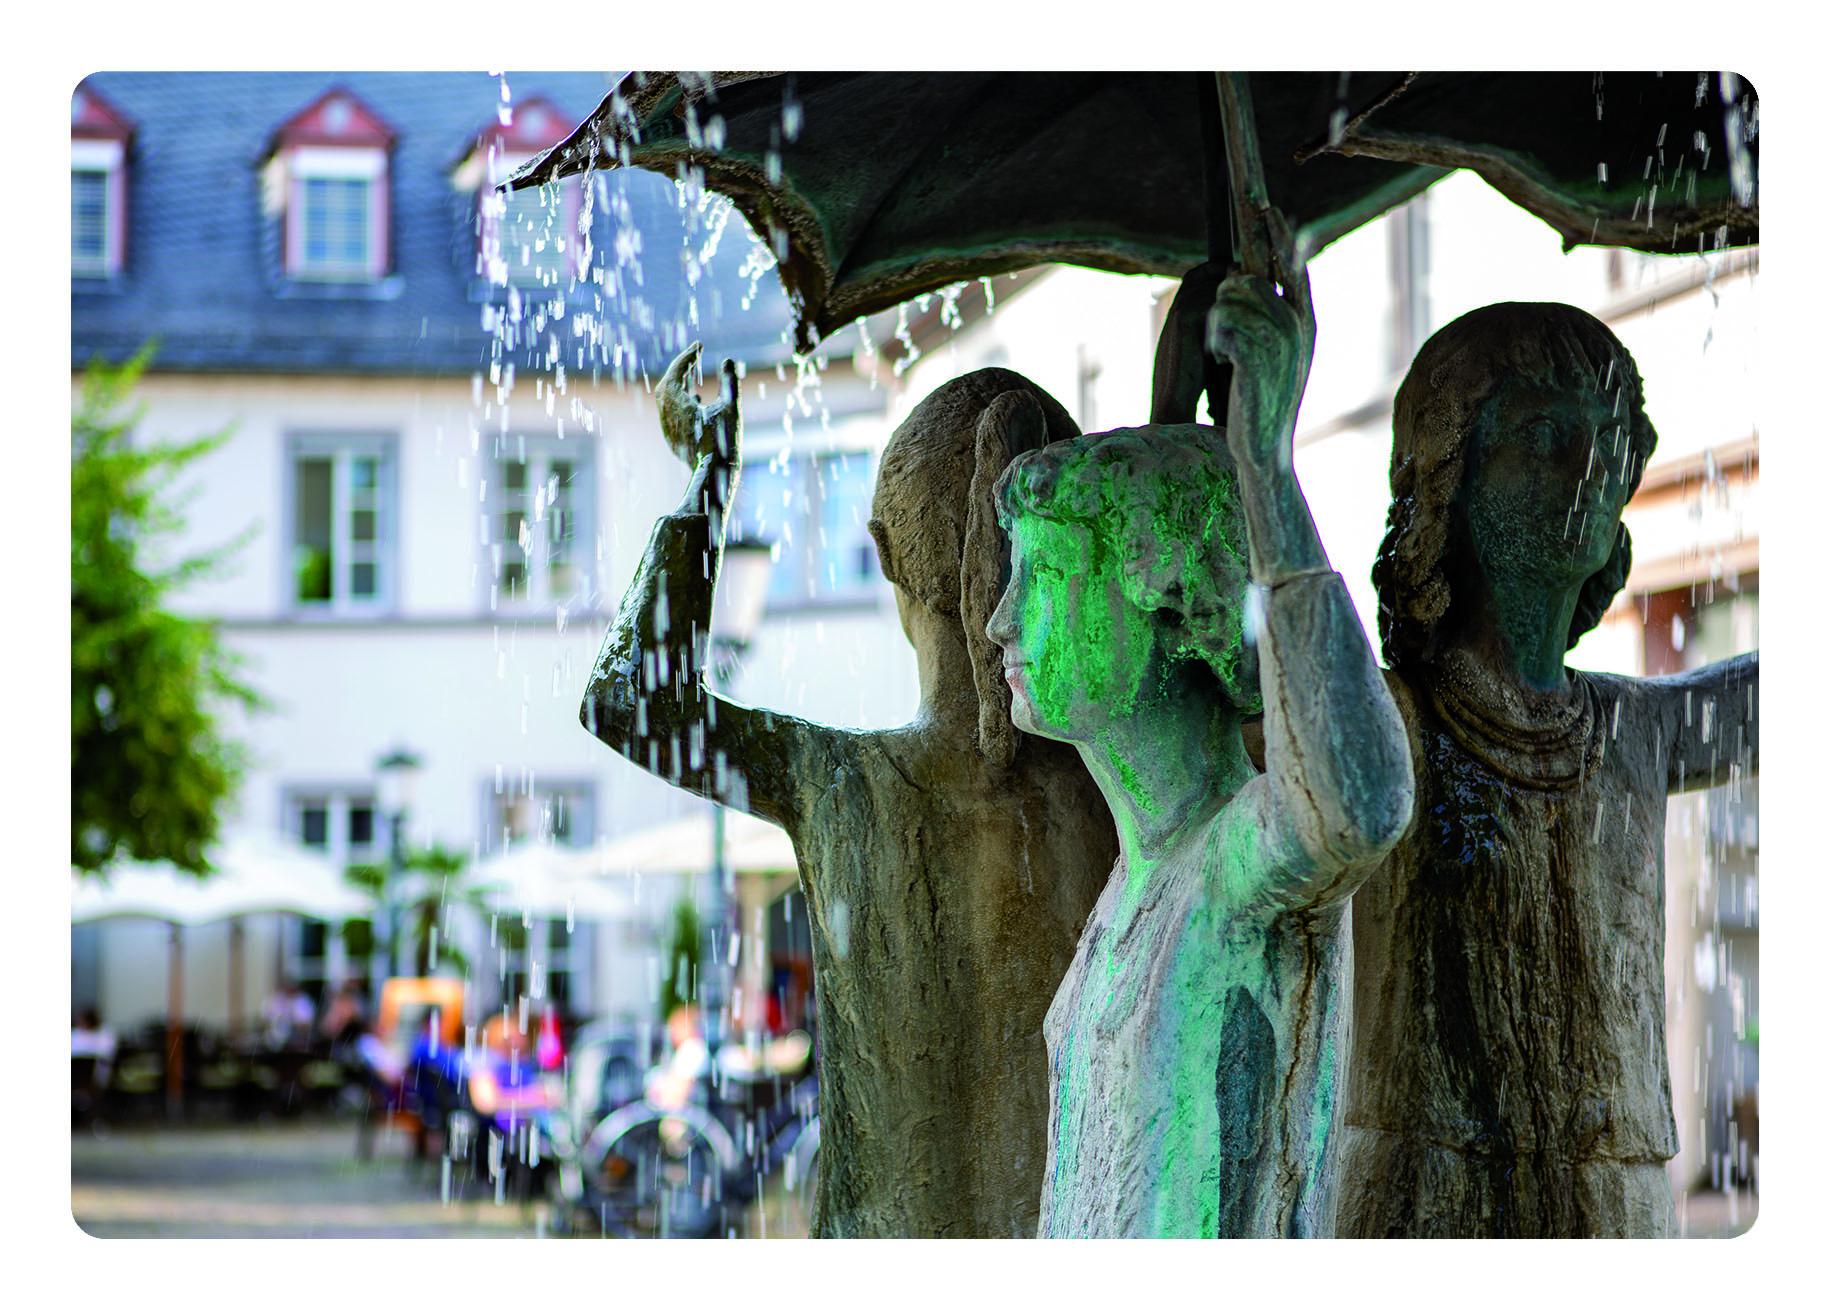 querformat-fotografie - Achim Katzberg - 06_1 Postkarten_Mainz_Mädchenbrunnen